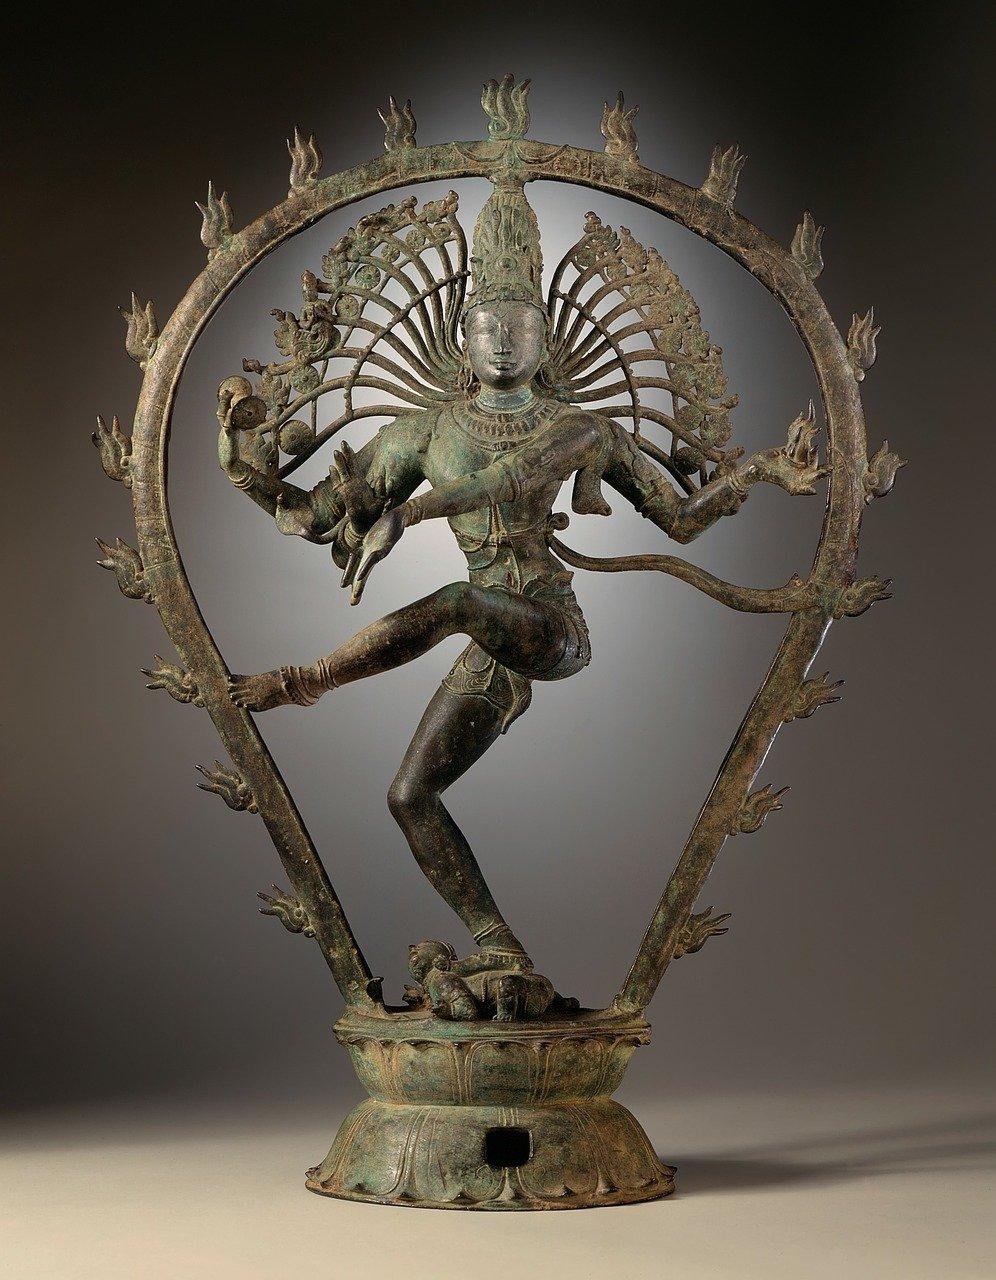 shiva god statue dance of destruction